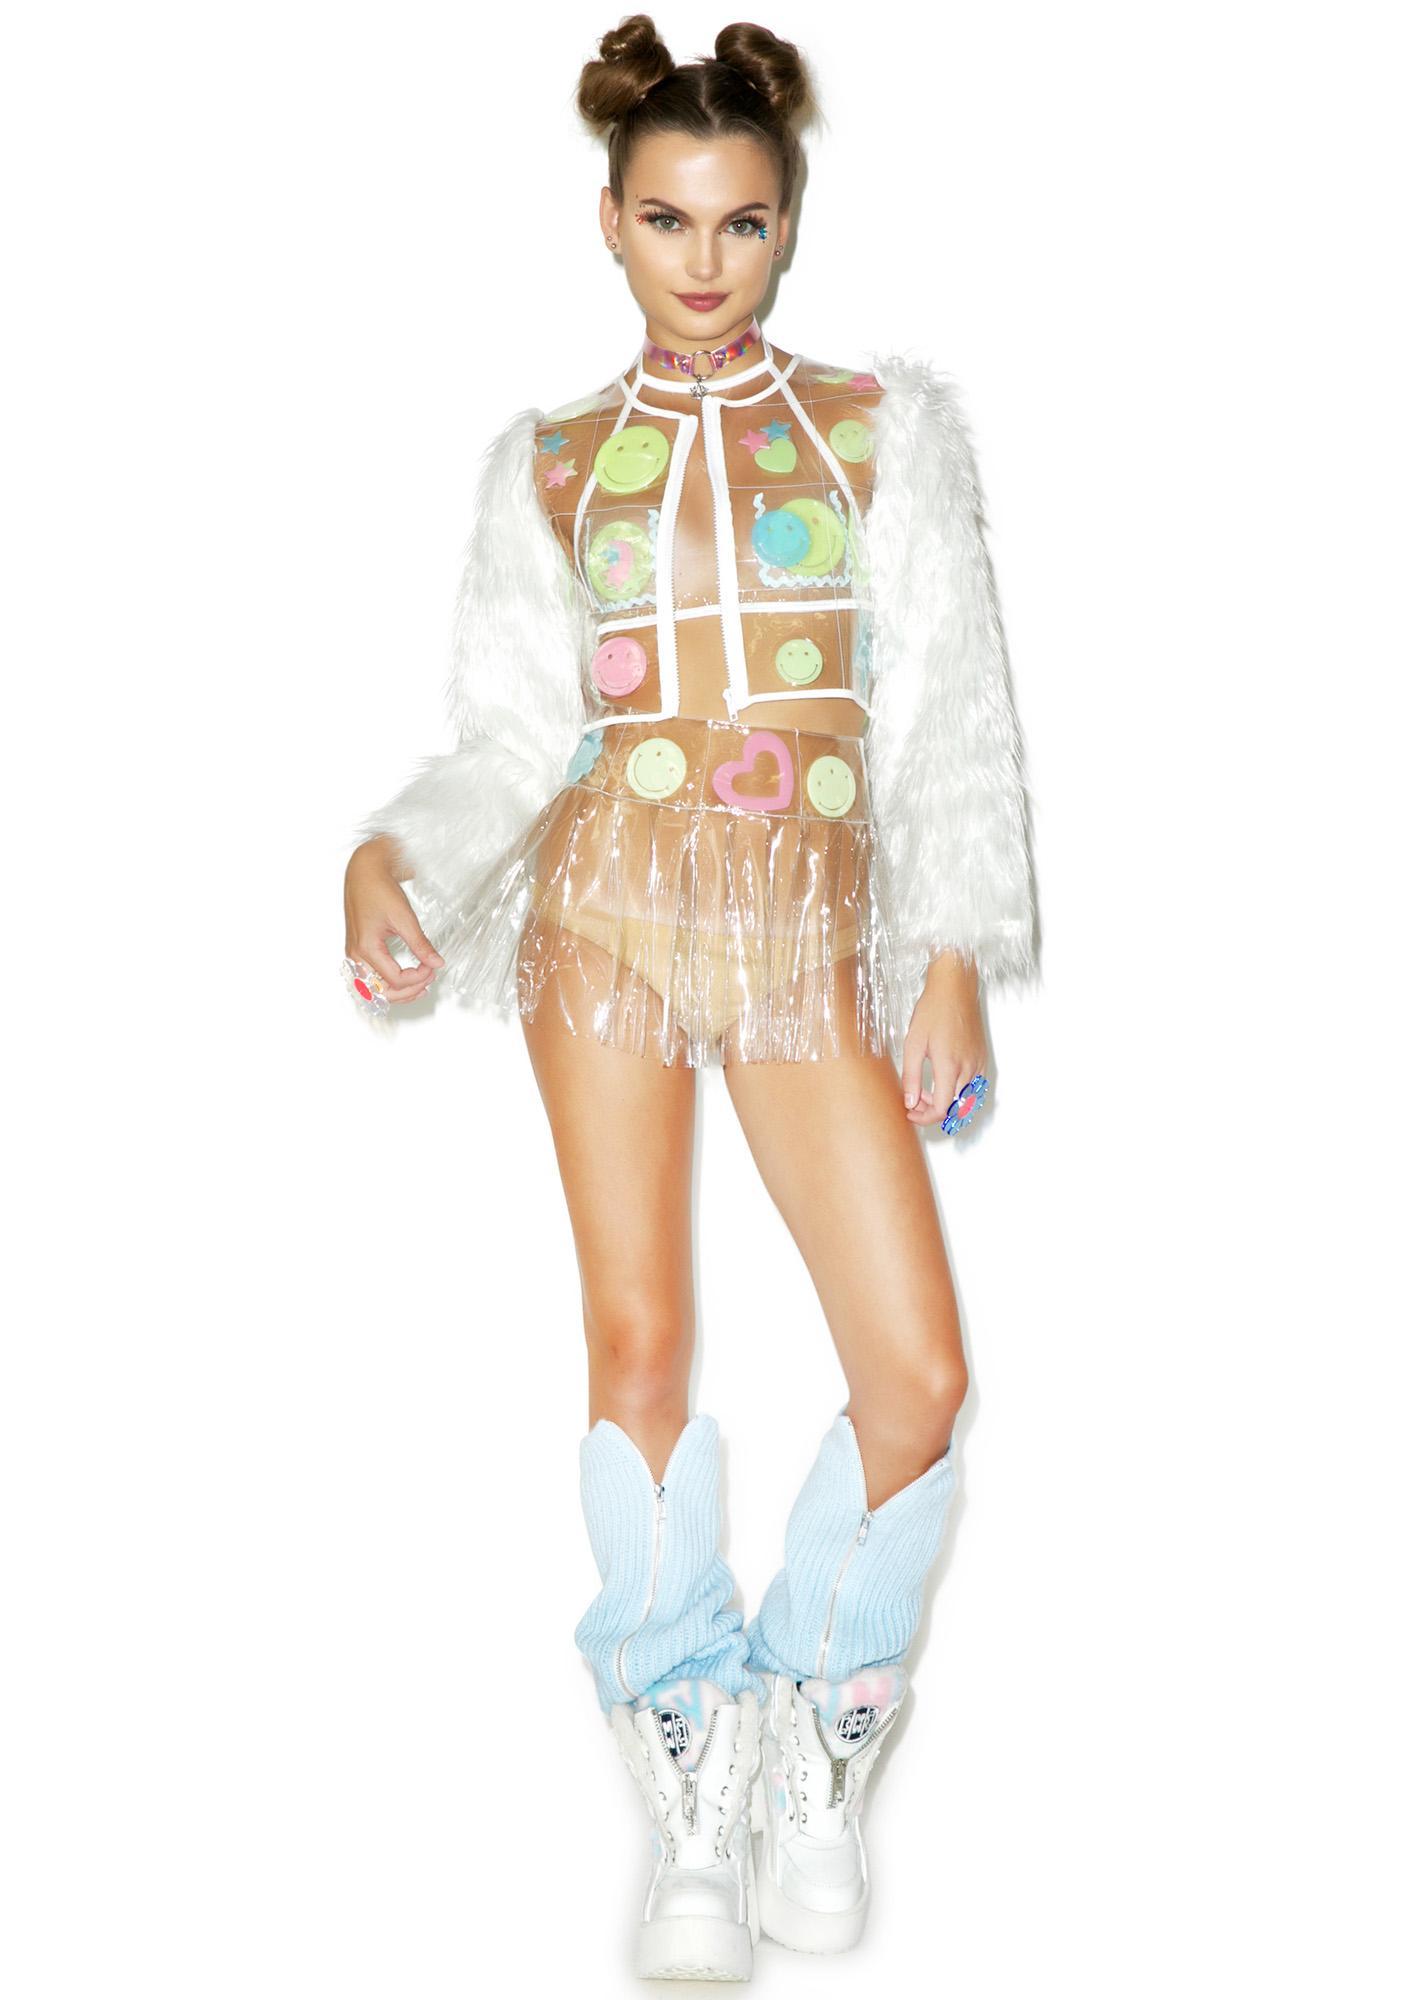 Indyanna Glowin' Spice Babe PVC Pleated Skirt